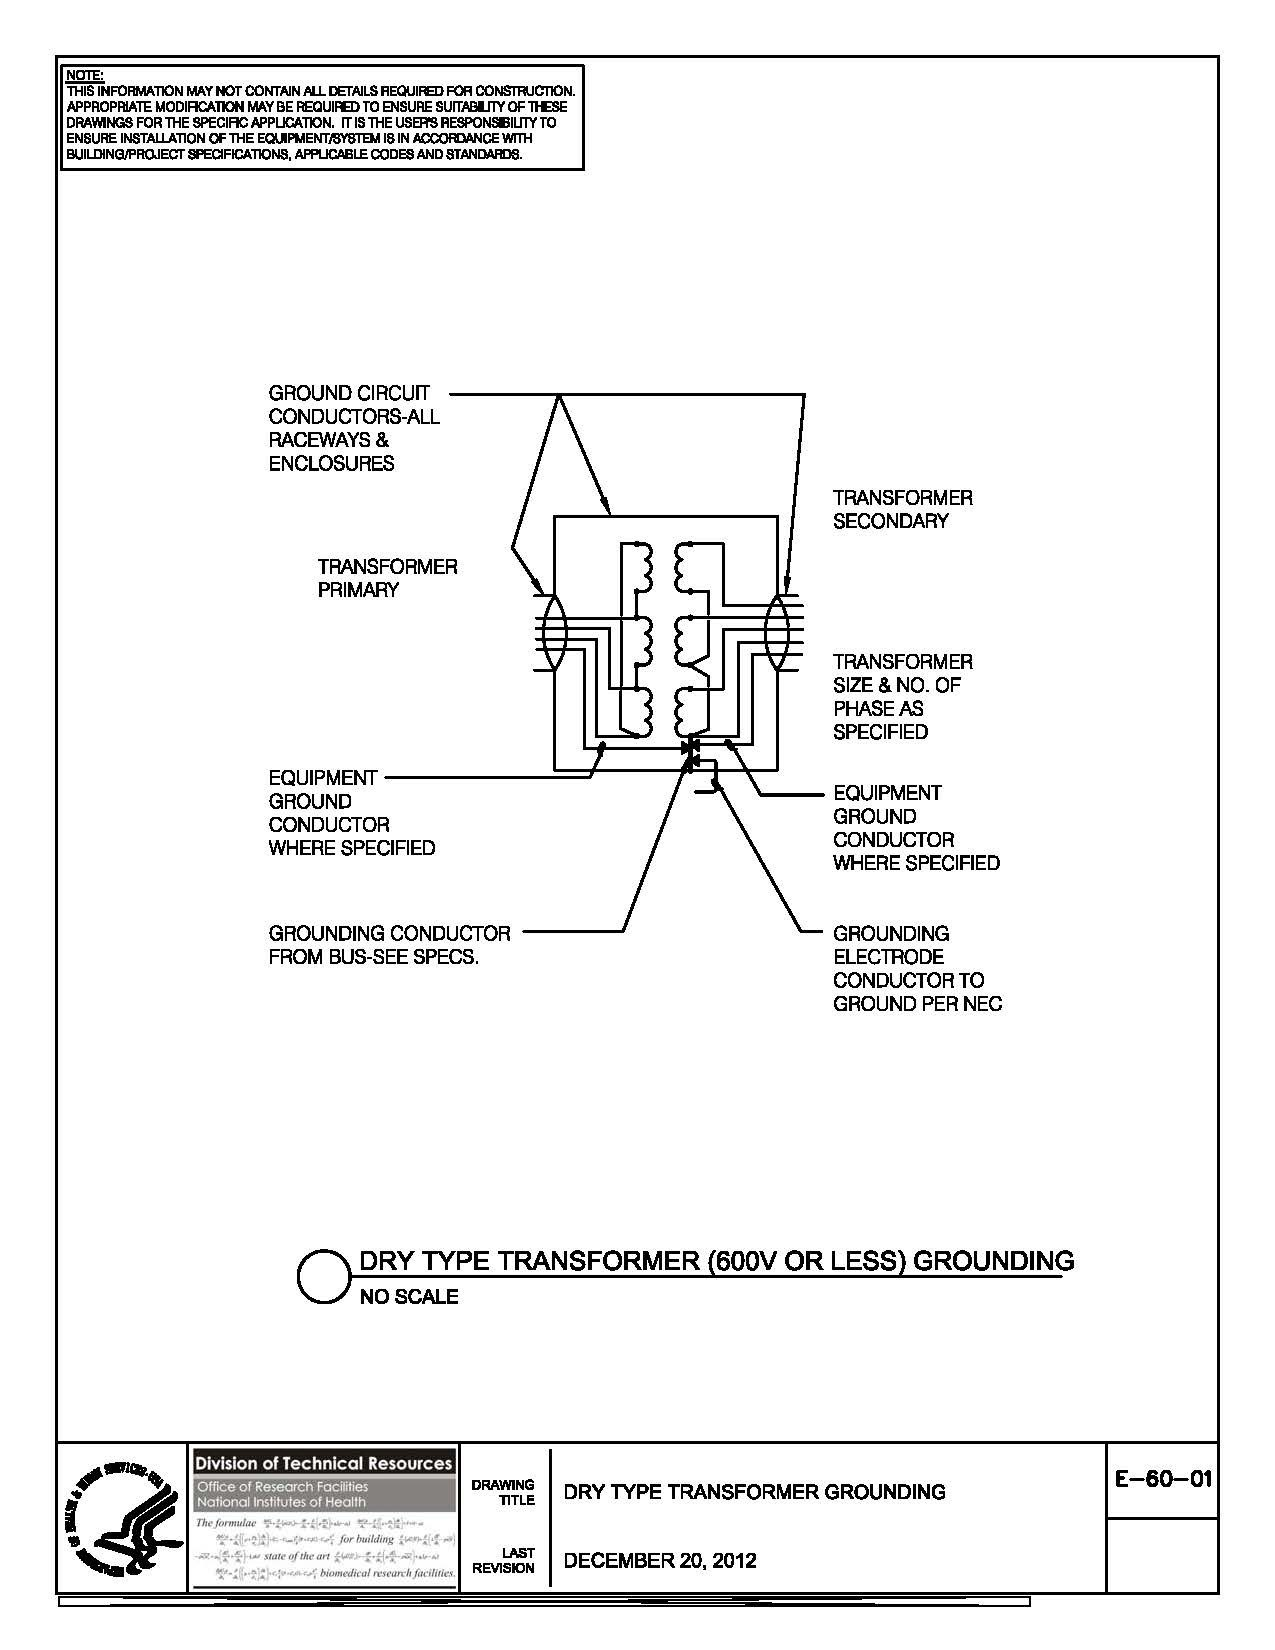 Standard Transformer Wiring - Radio Wiring Diagram •